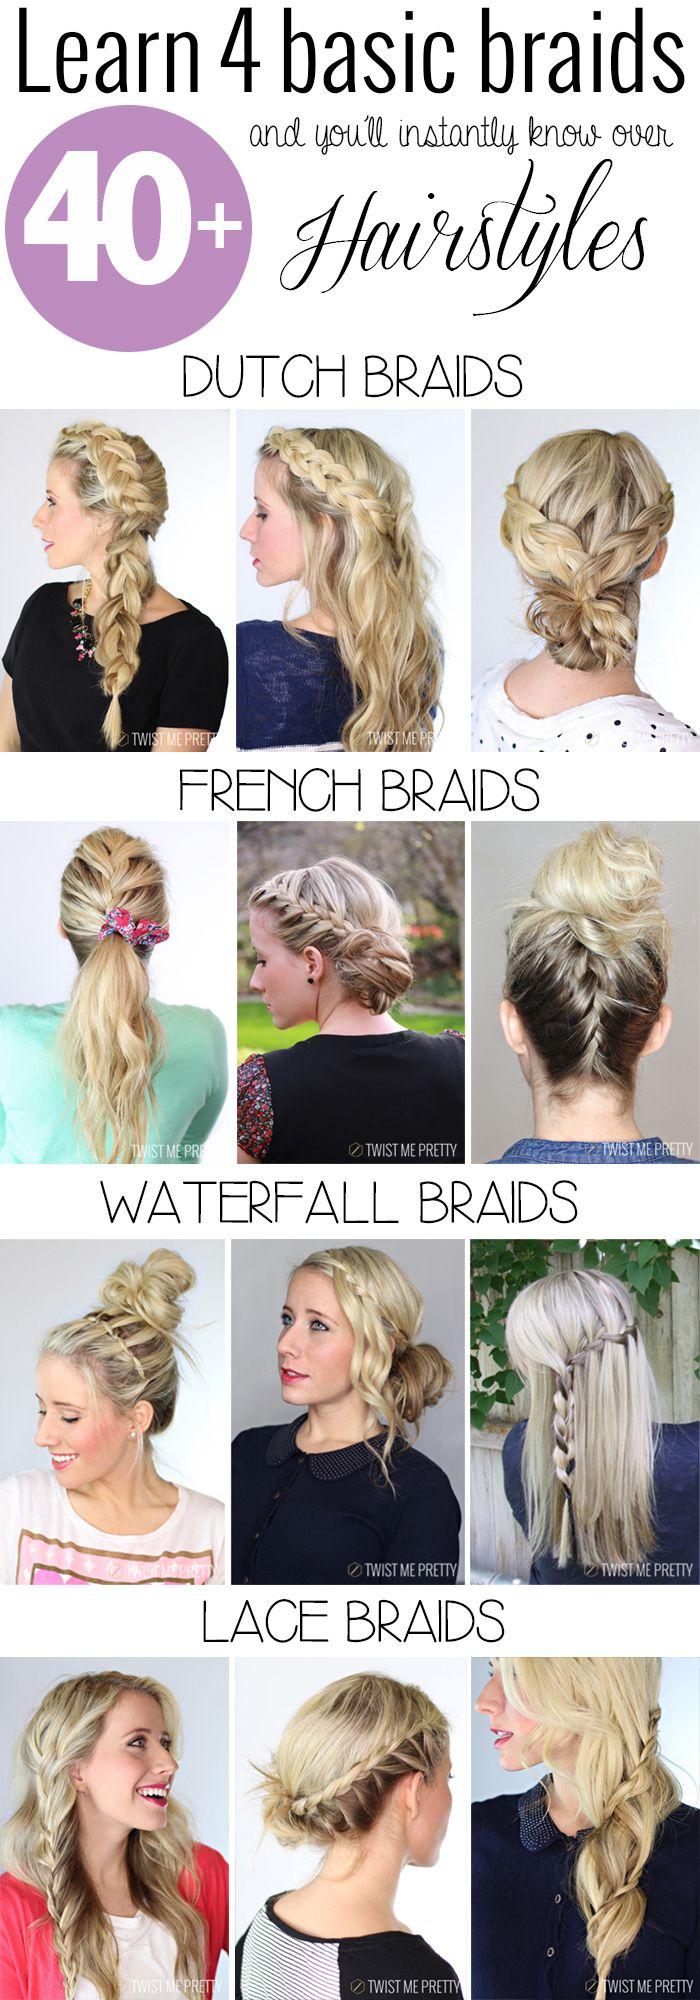 Hairstyle tips and tricks see here pinmakeuptipshot